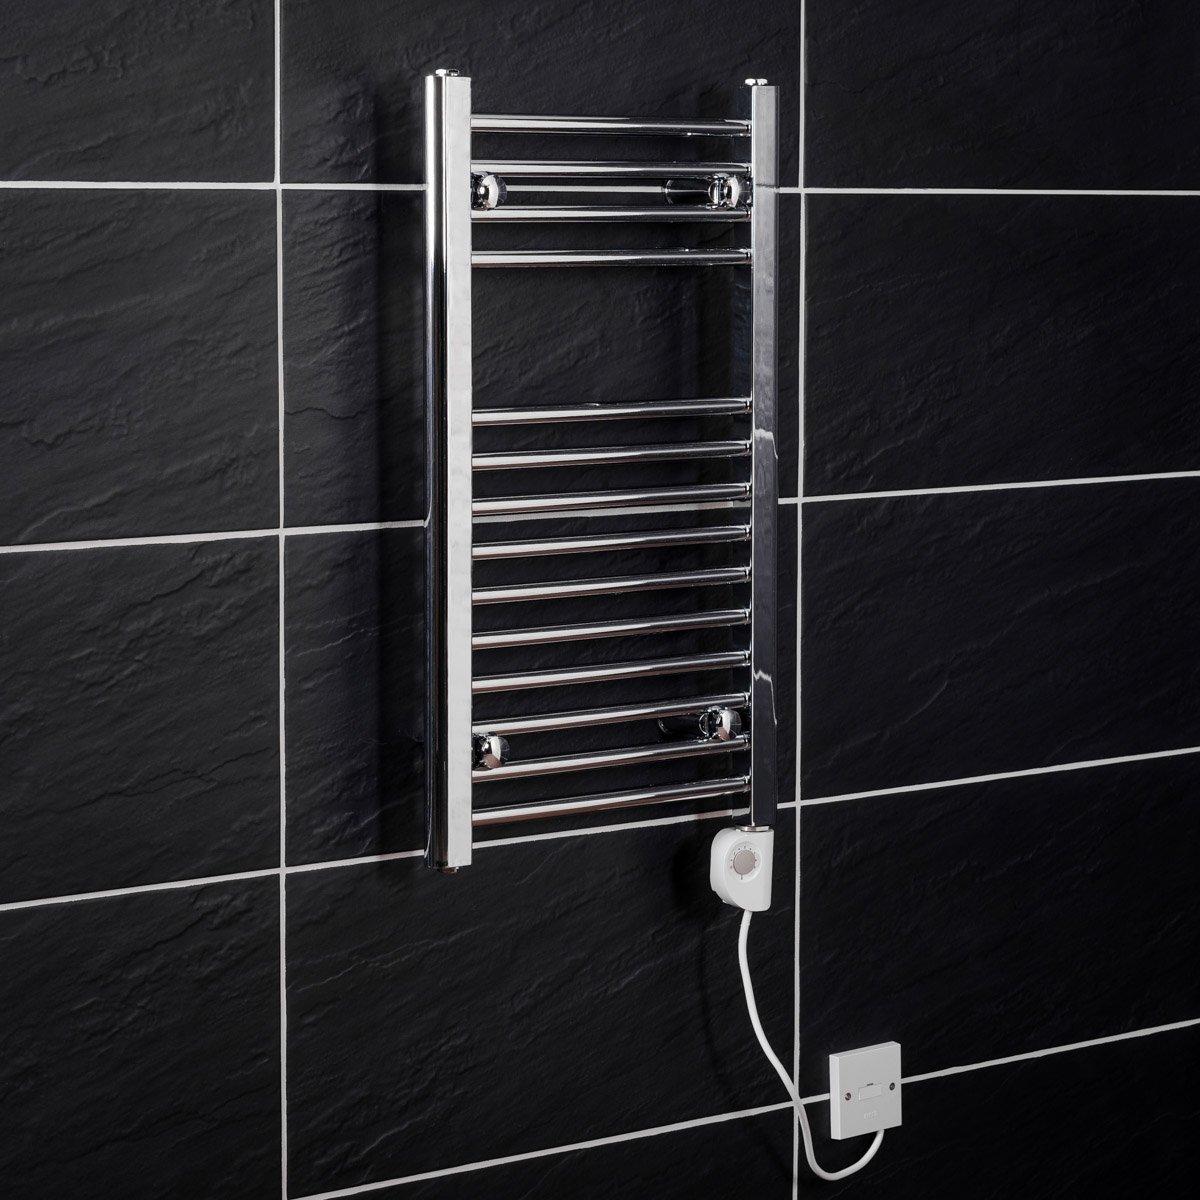 Electric Bathroom Towel Heaters: Bathroom Chrome Electric Ladder Heated Towel Rail Warmer